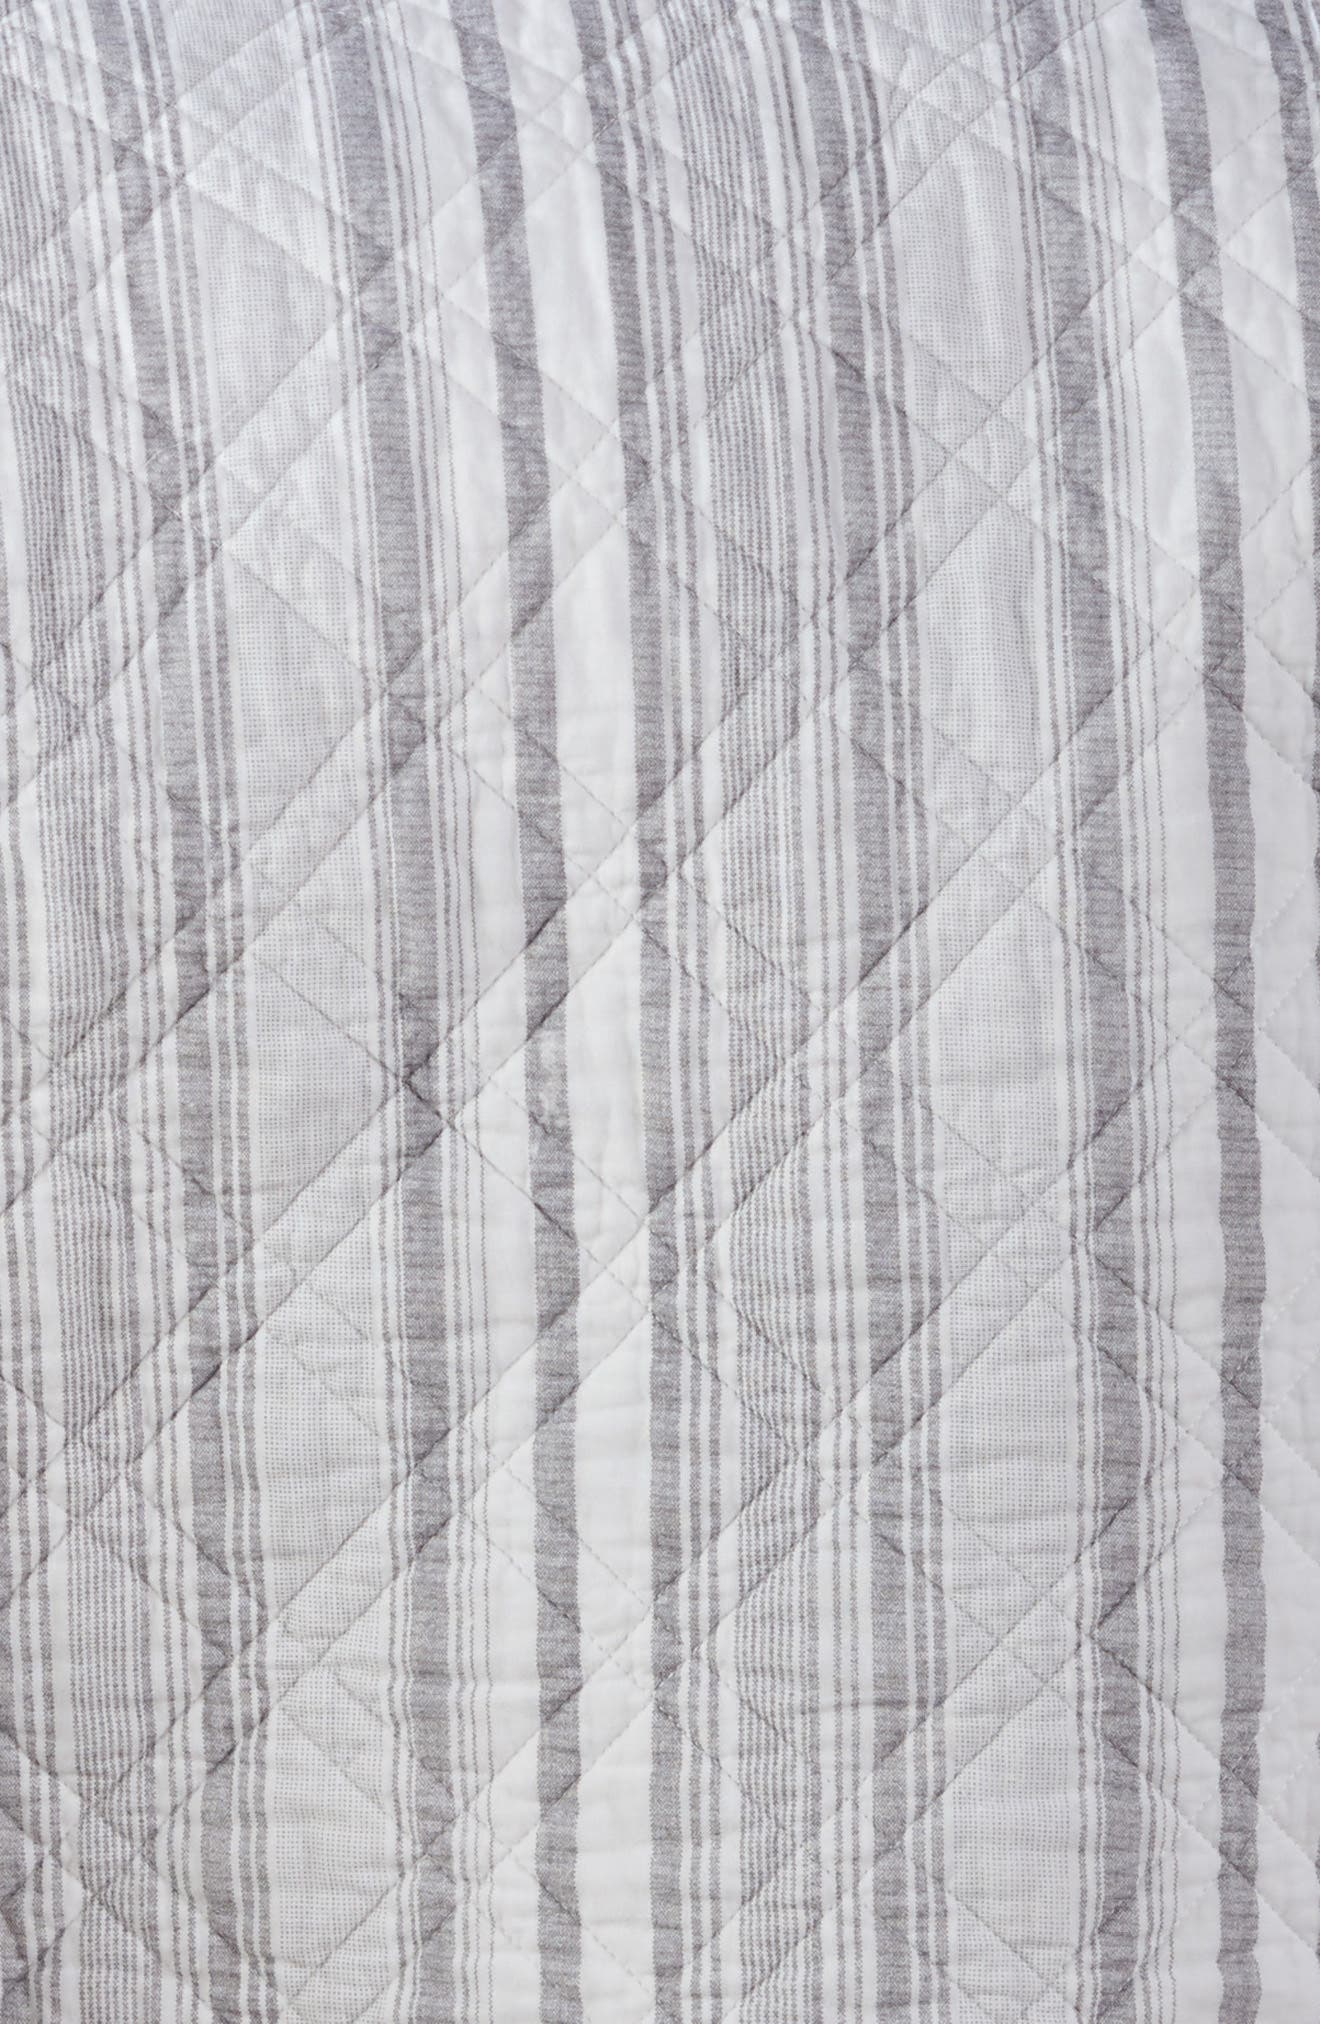 Winterland Reversible Quilt,                             Alternate thumbnail 4, color,                             Grey